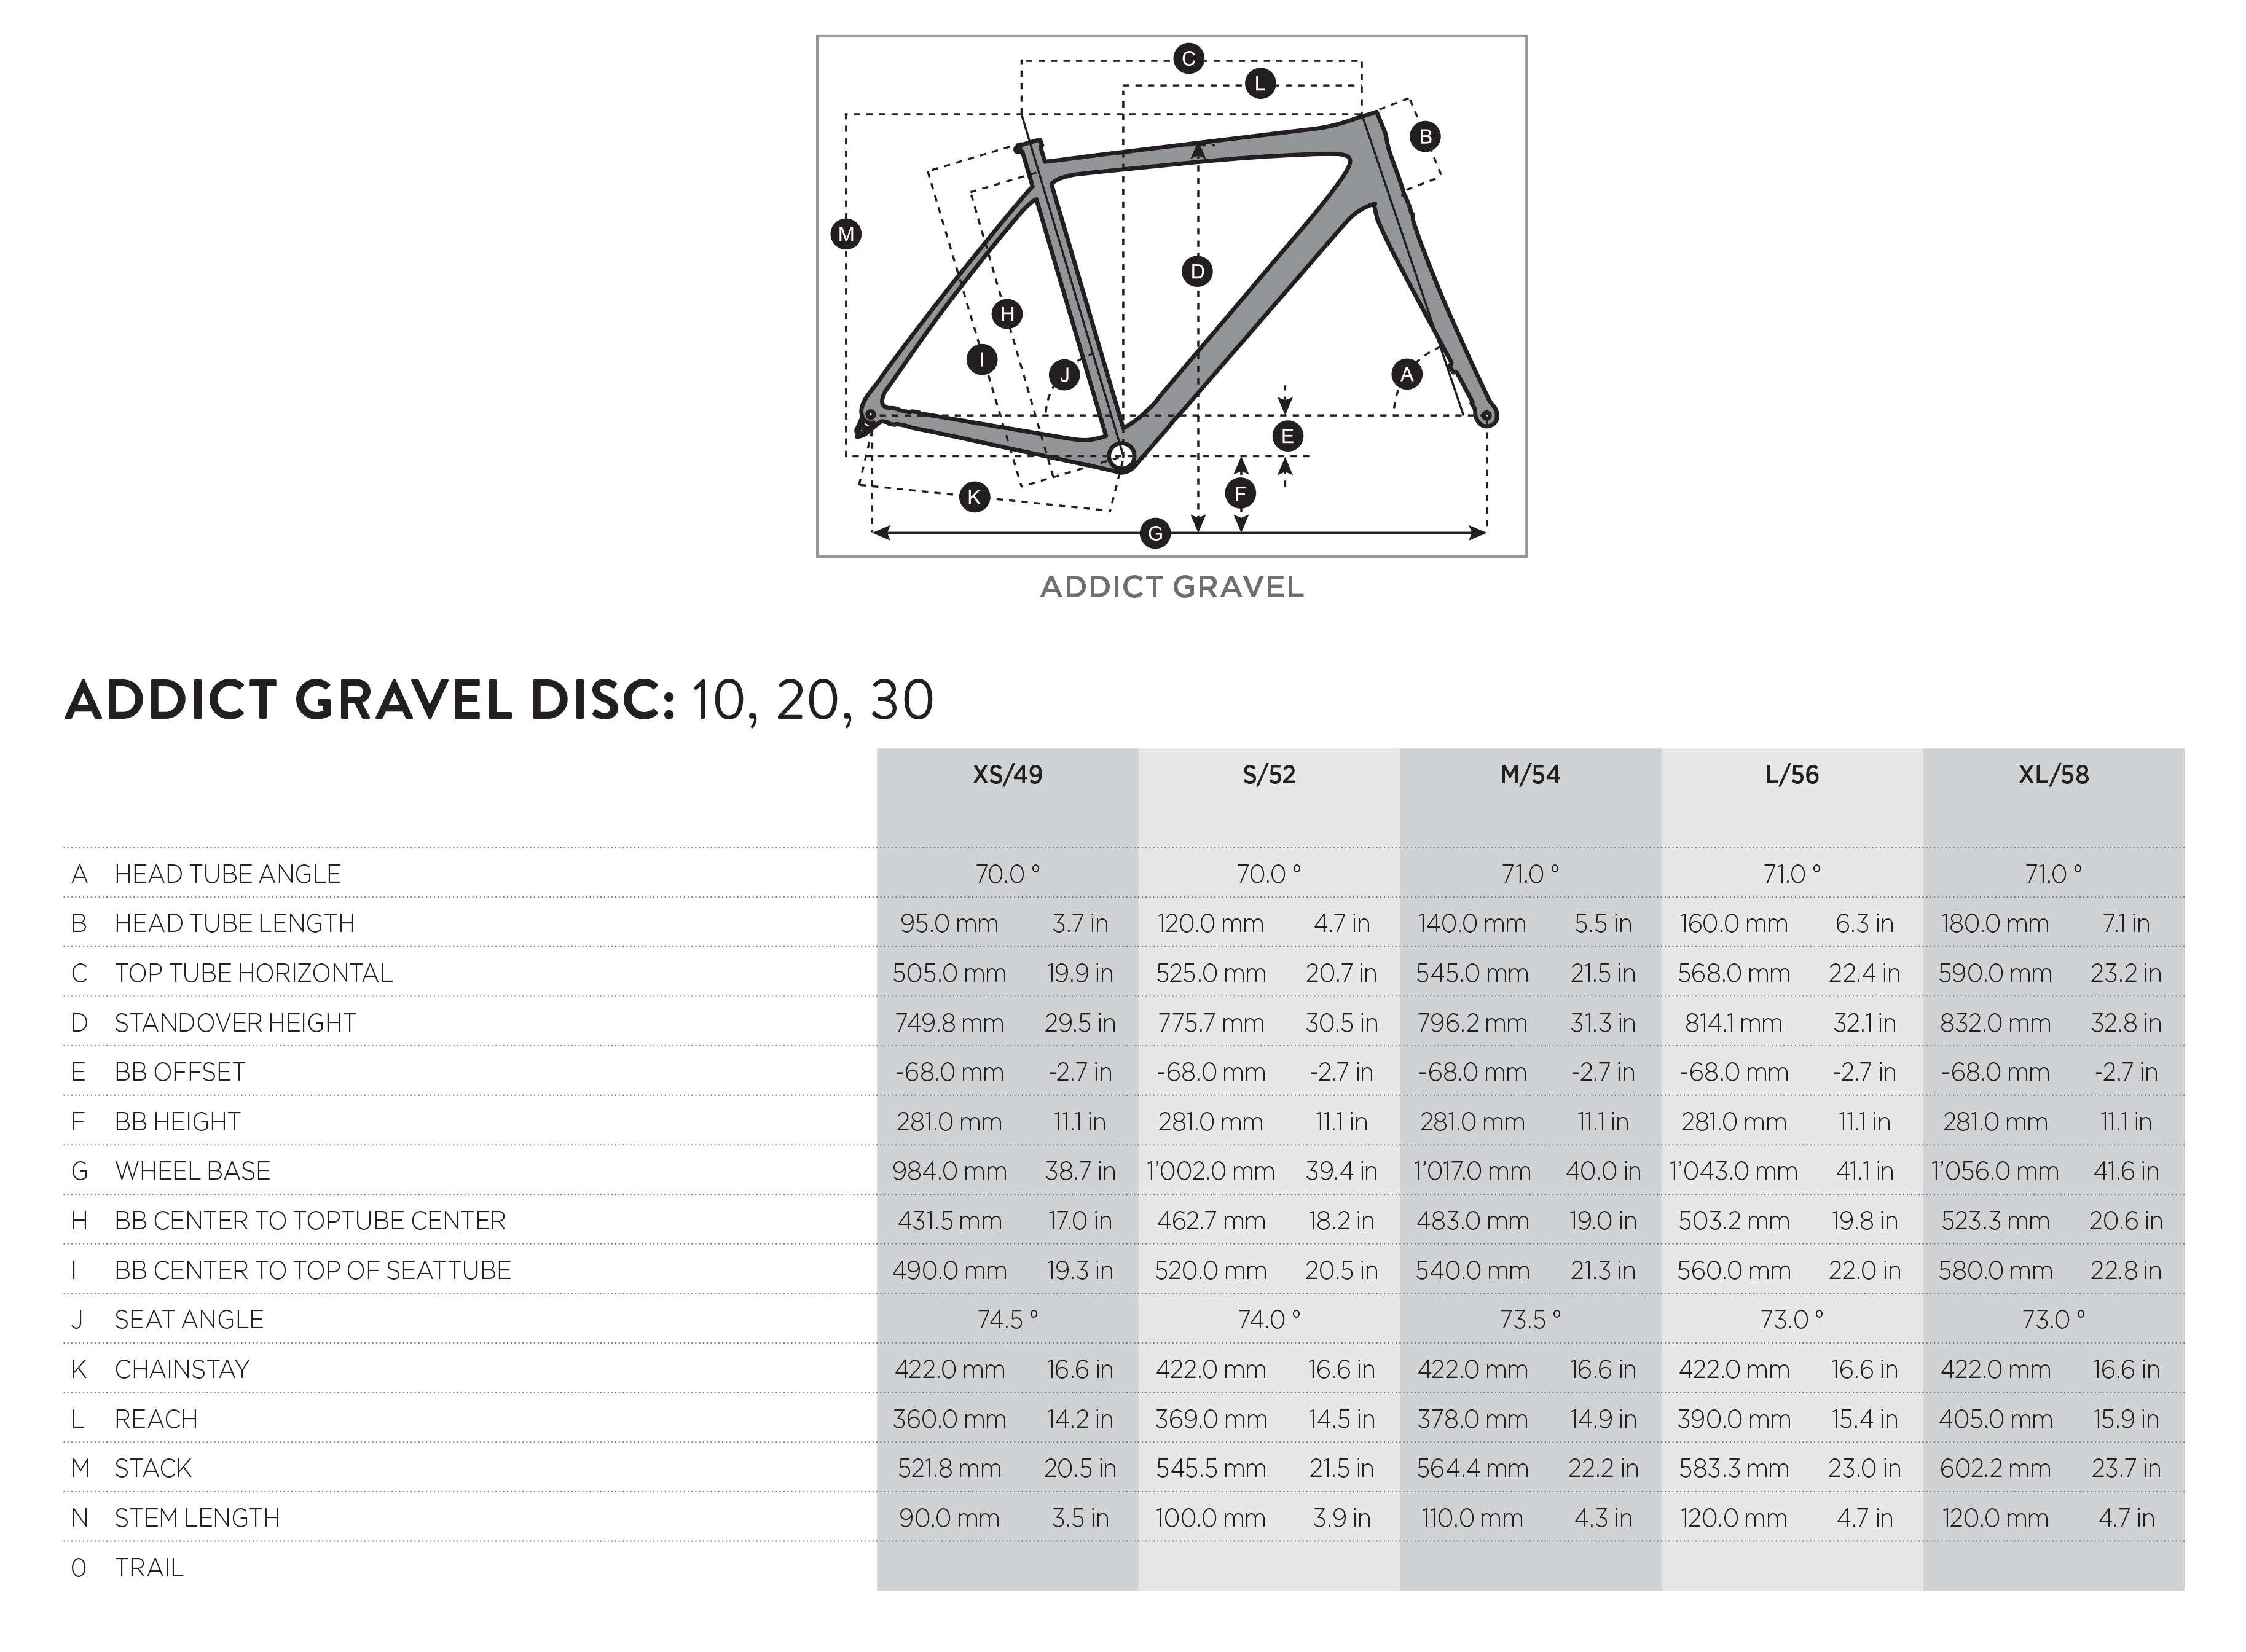 Scott Addict Gravel geometry chart